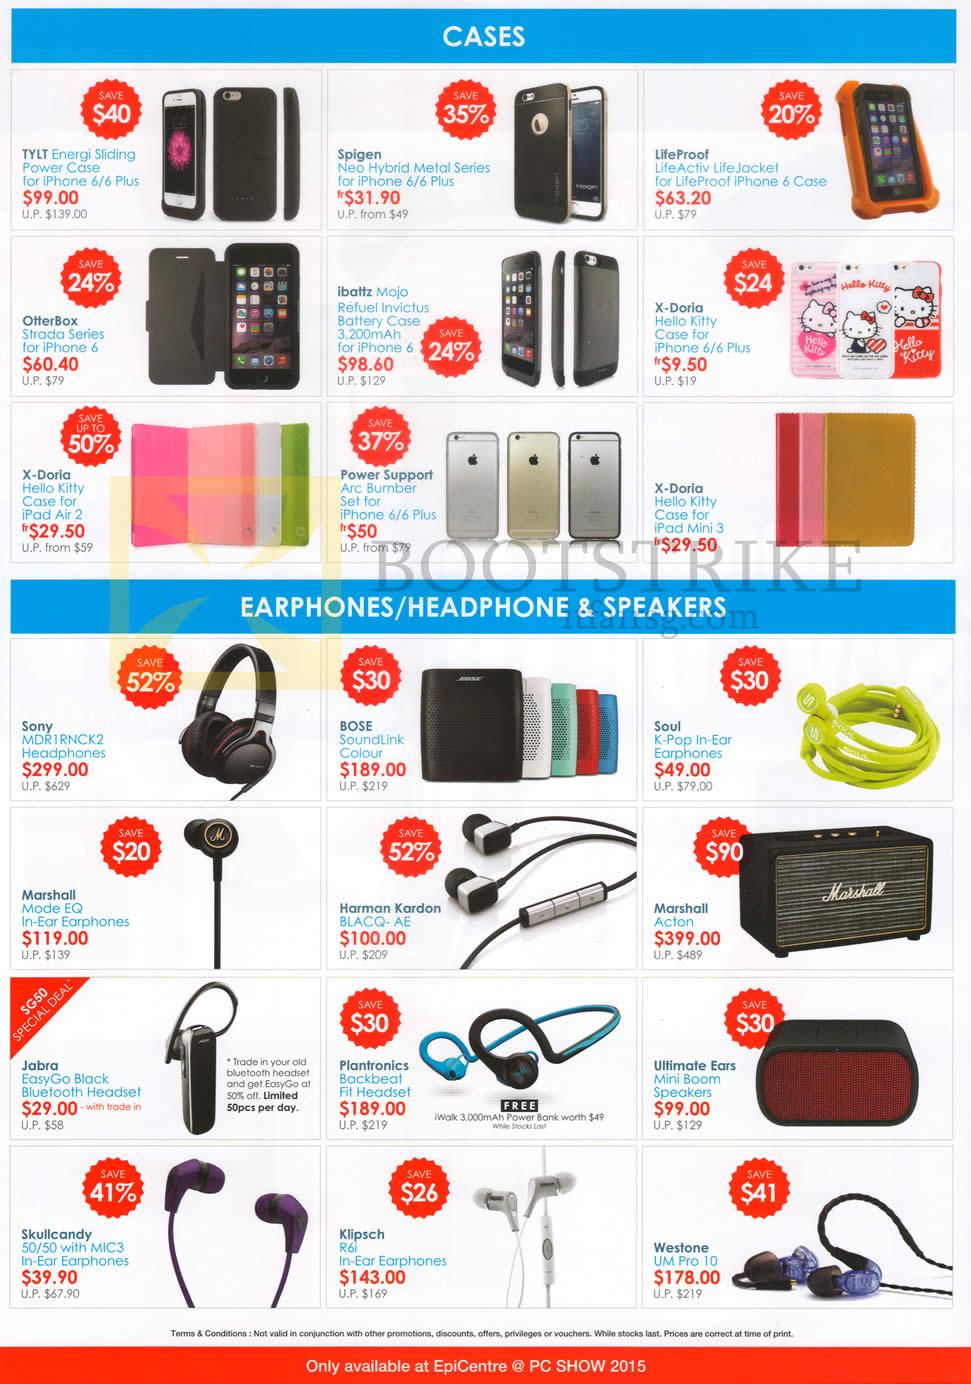 PC SHOW 2015 price list image brochure of EpiCentre Accessories Cases, Earphones, Headphones, Speakers